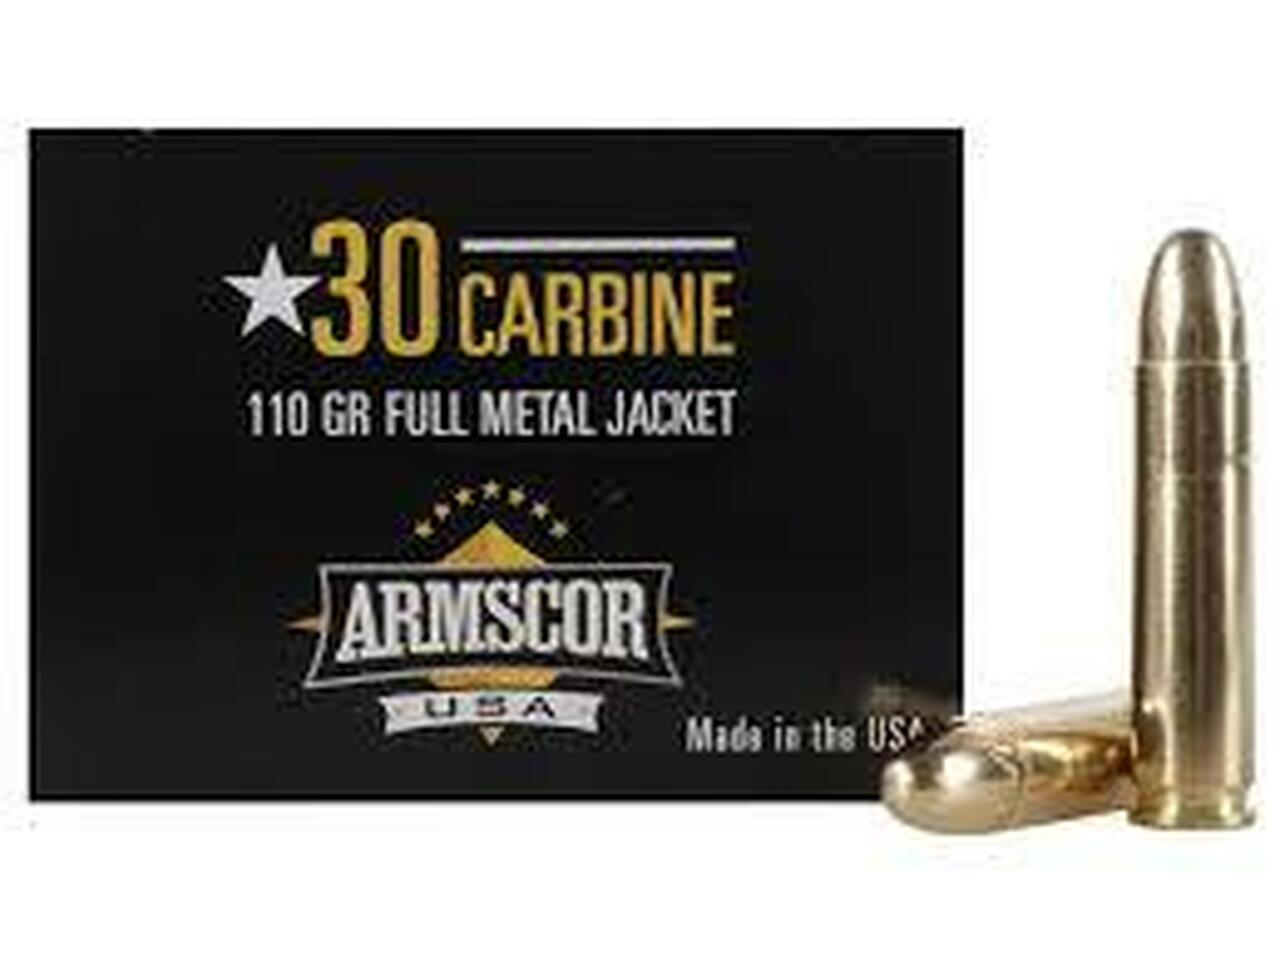 30 Carbine Ammo